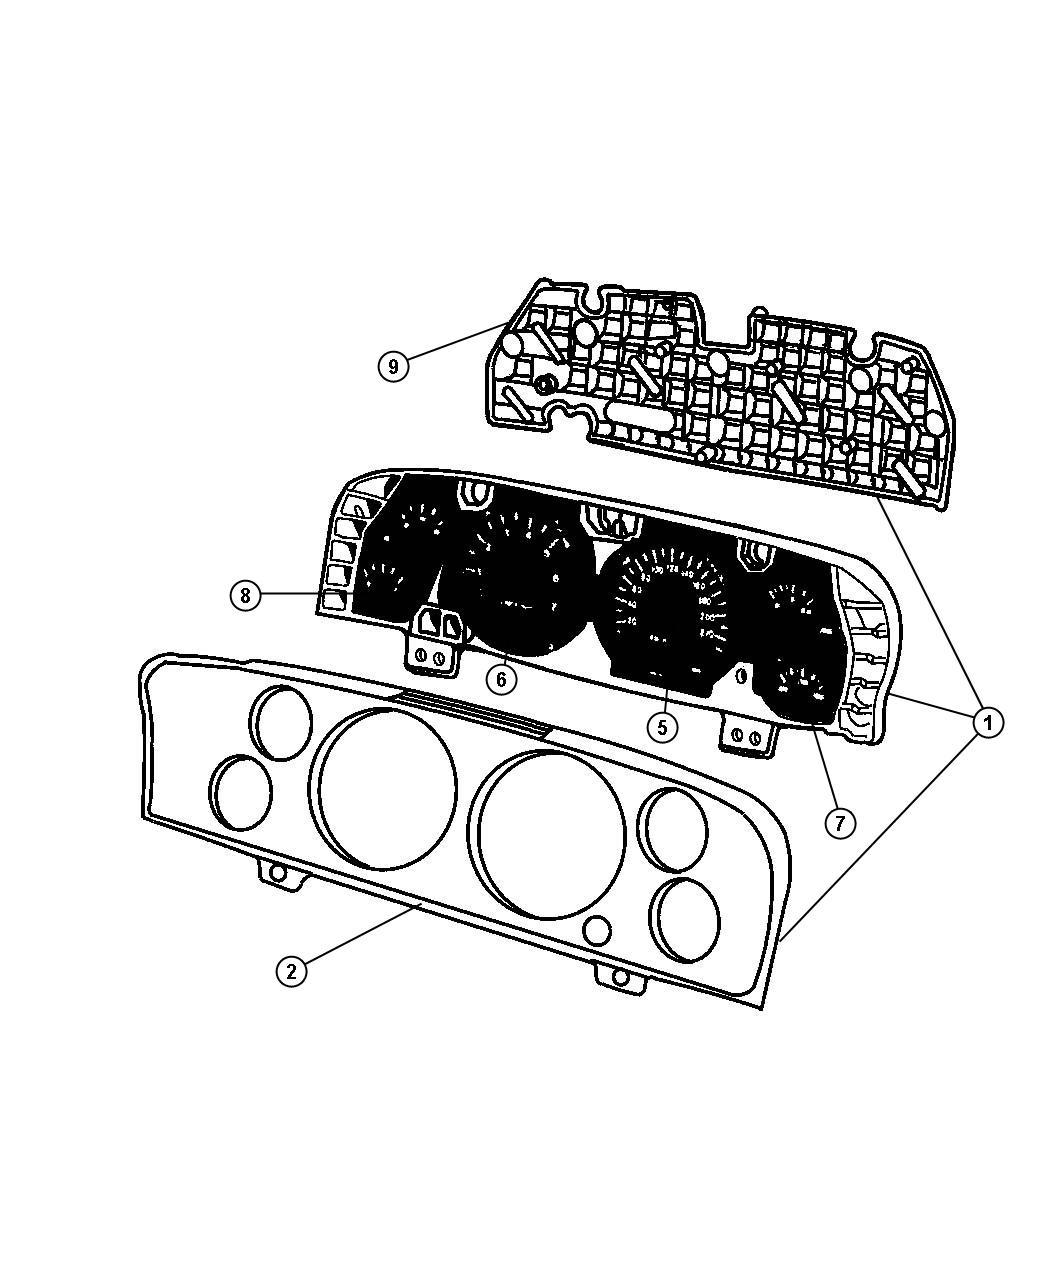 Chrysler Sebring Bulb Pc121 Illumination